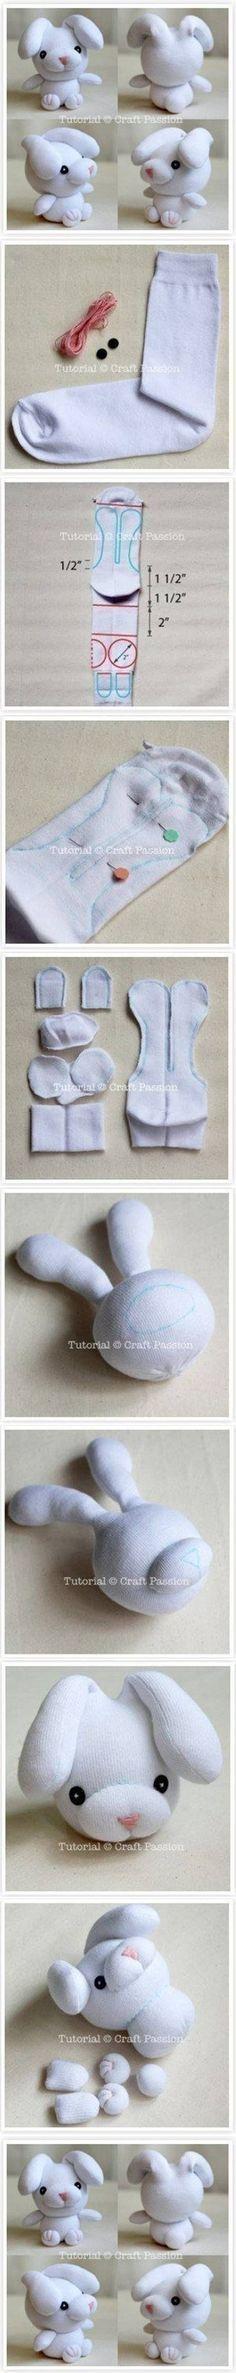 DIY Sew Sock Bunny DIY Projects / UsefulDIY.com